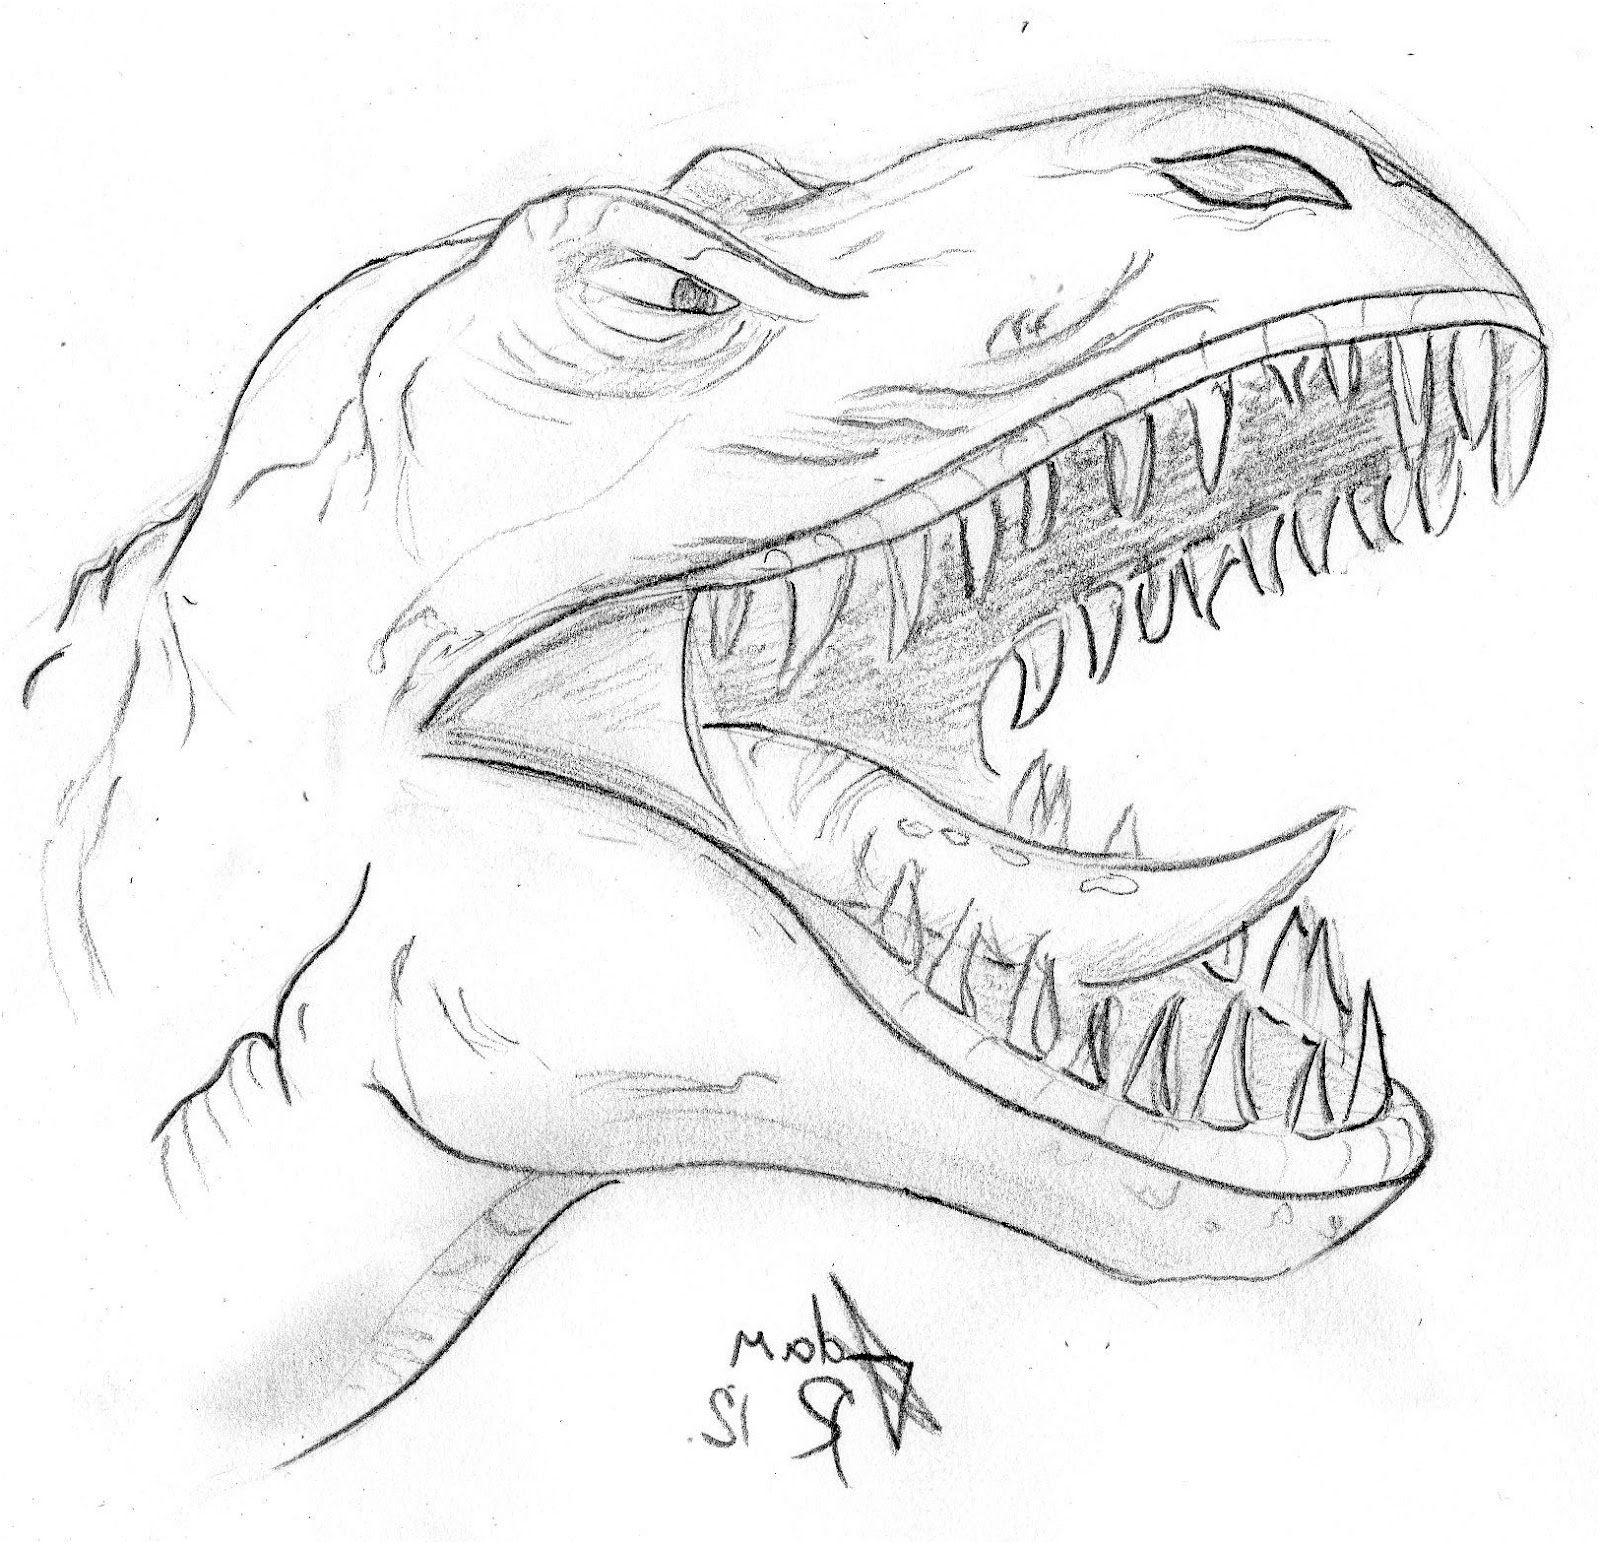 11 Créatif Coloriage Tyrannosaure Photos   Dessin dinosaure, Coloriage dinosaure, Coloriage